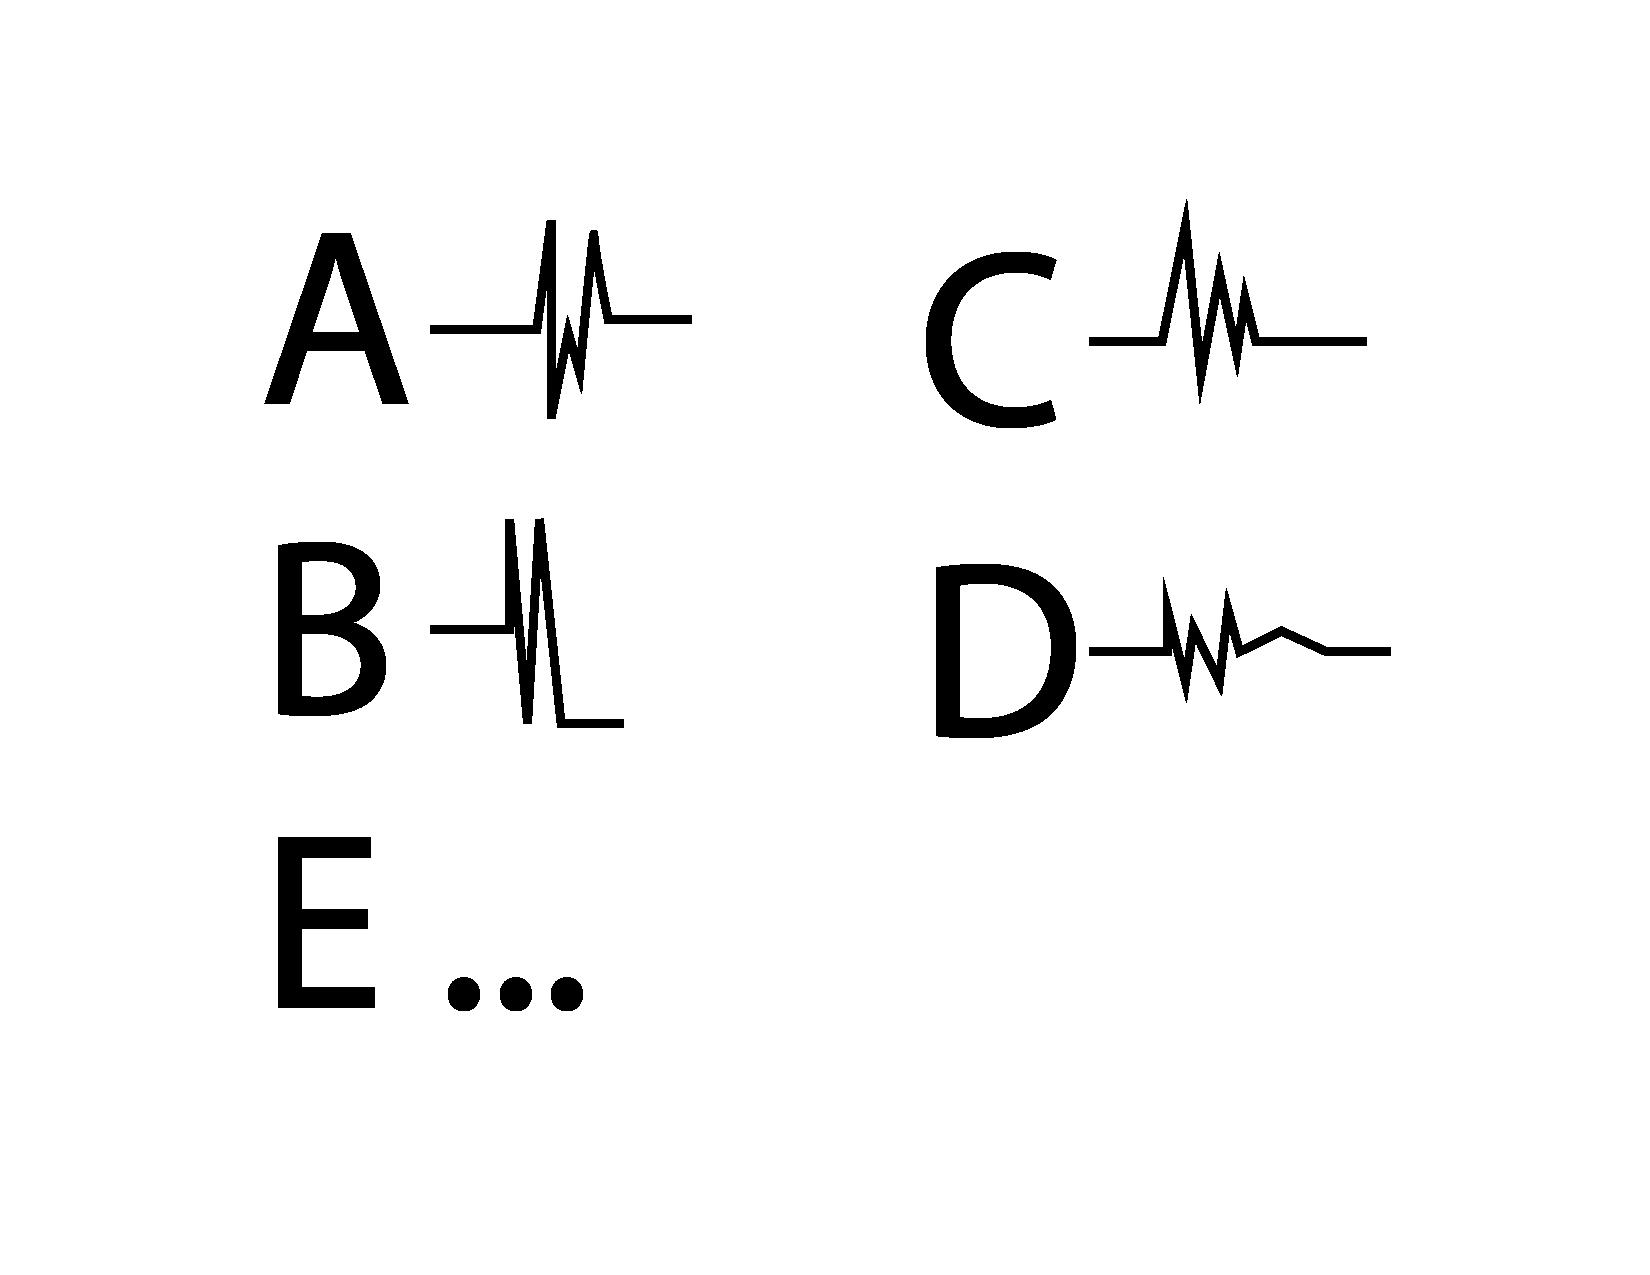 Figure 1 : Alphabet